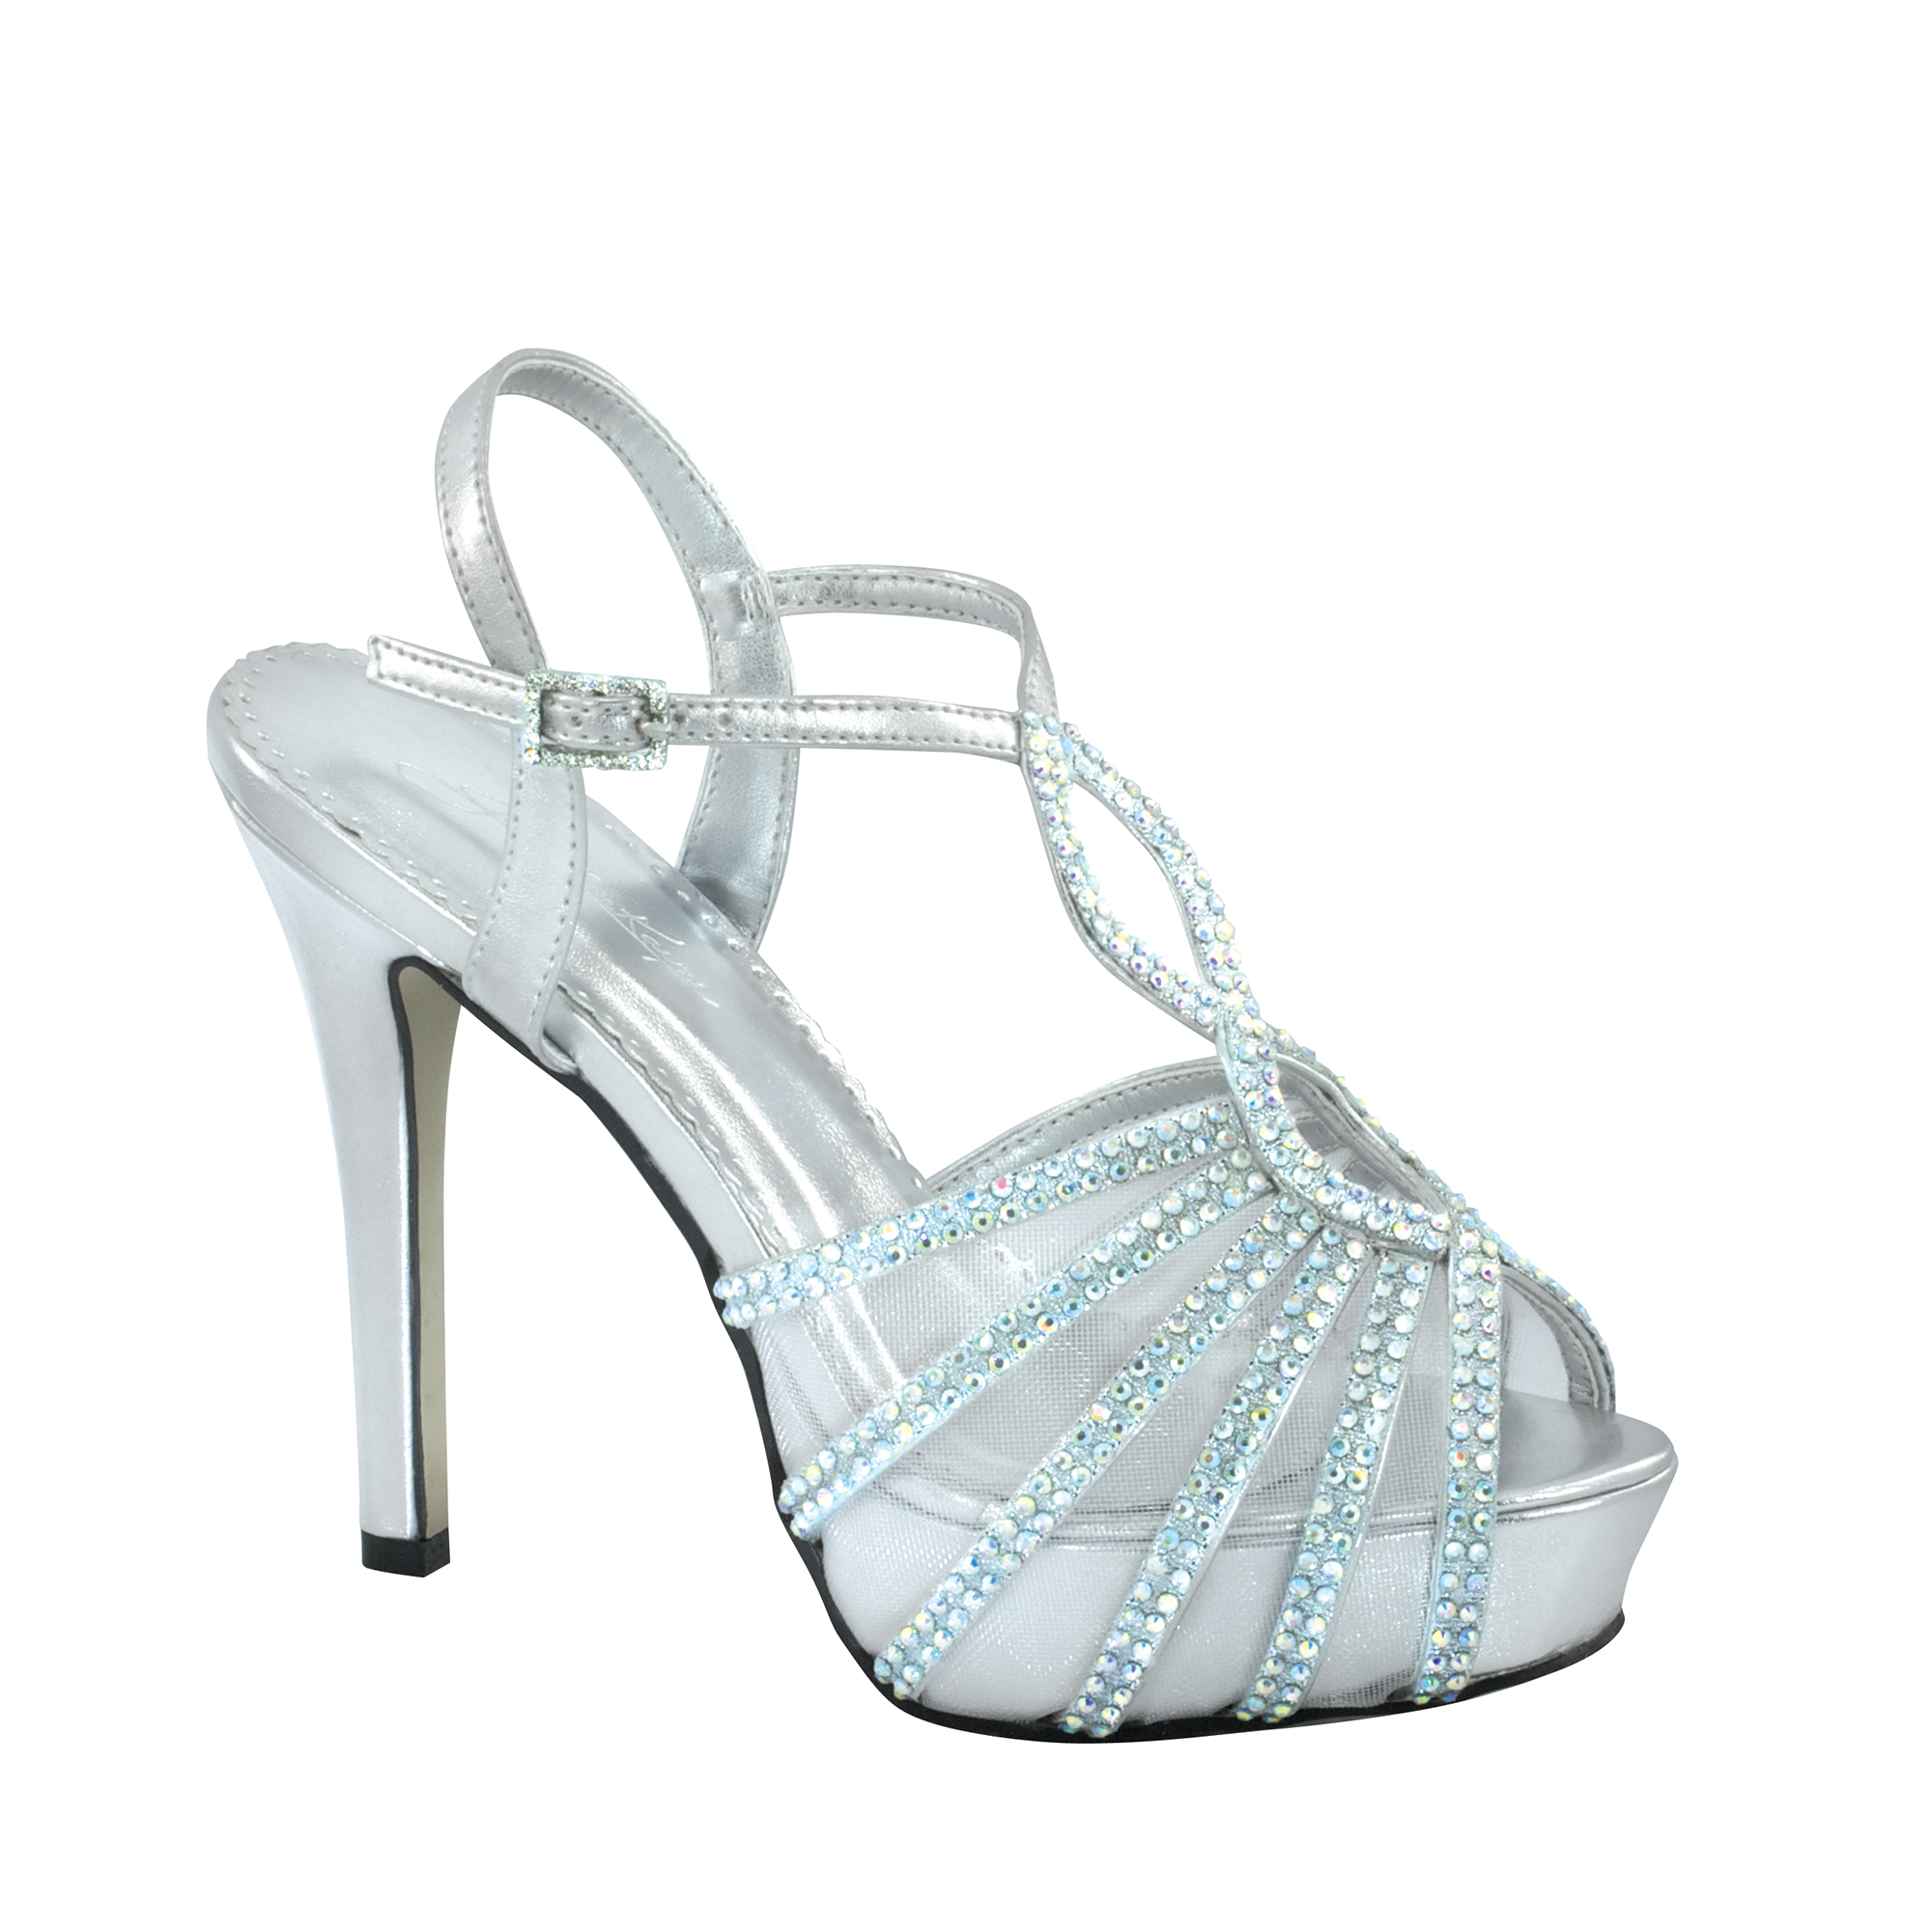 Johnathan Kayne Womens Glasgow Platform Sandal,Silver Metallic,6 M US